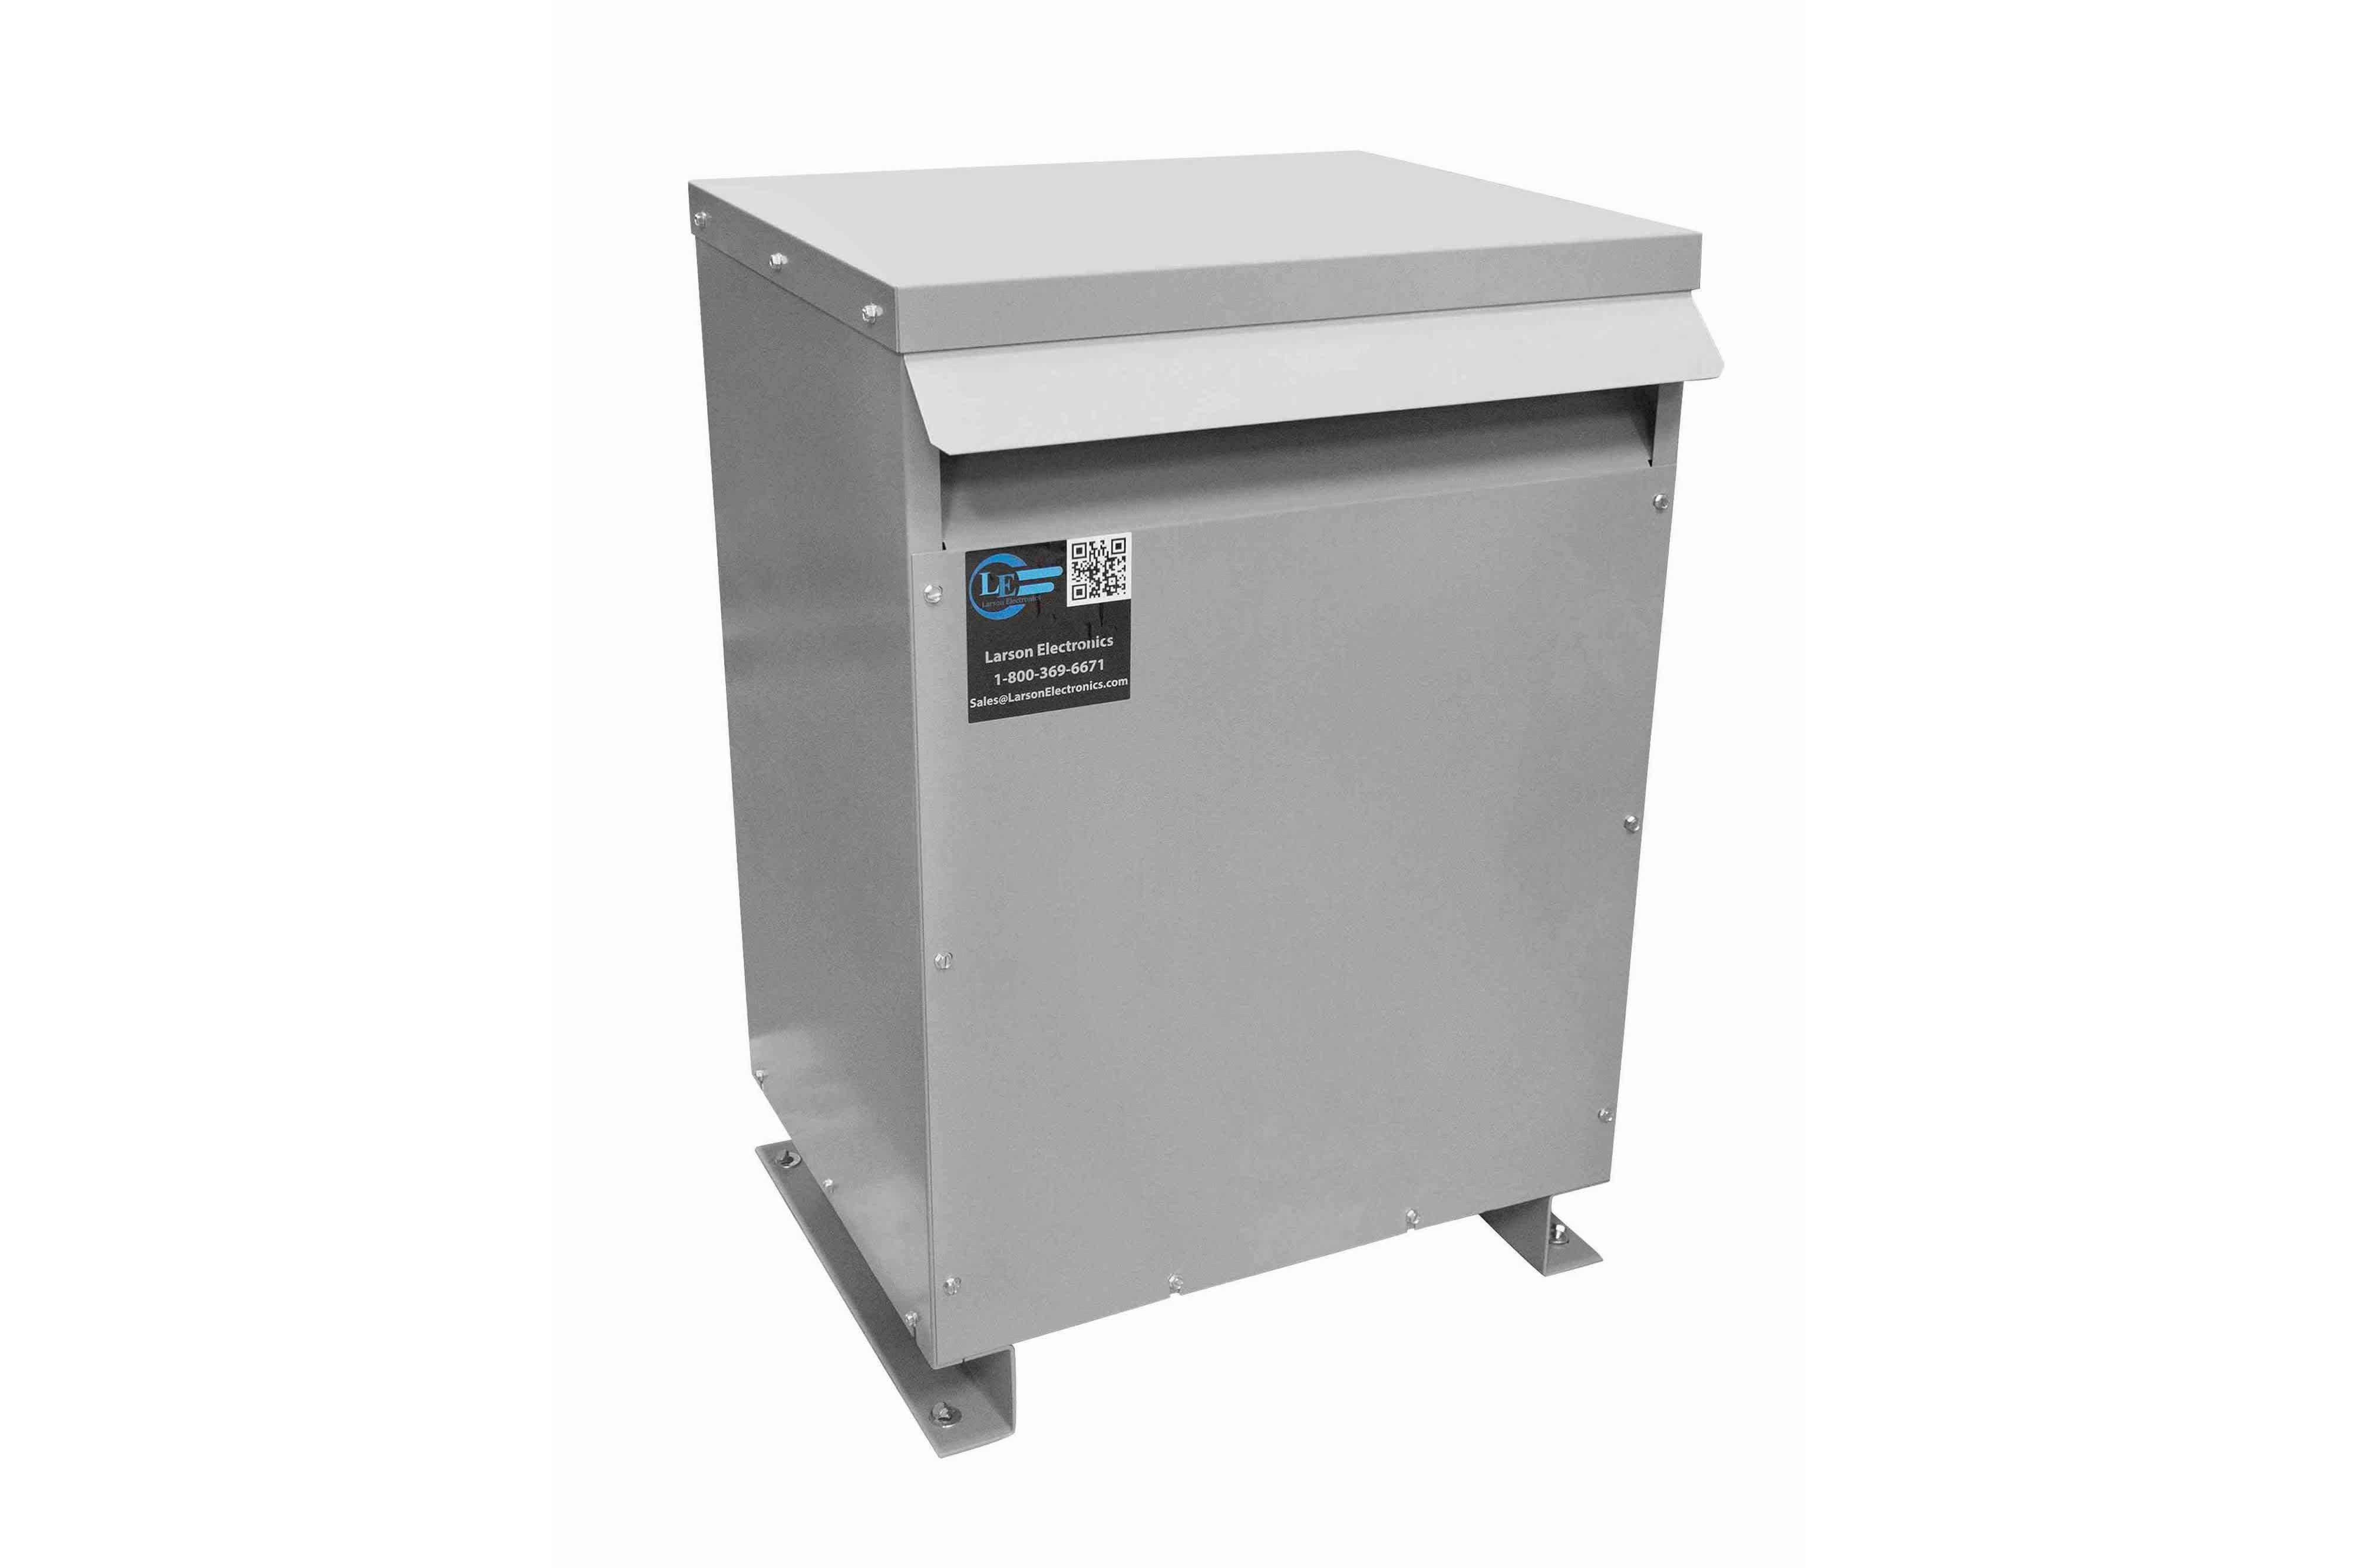 22.5 kVA 3PH Isolation Transformer, 480V Wye Primary, 400Y/231 Wye-N Secondary, N3R, Ventilated, 60 Hz